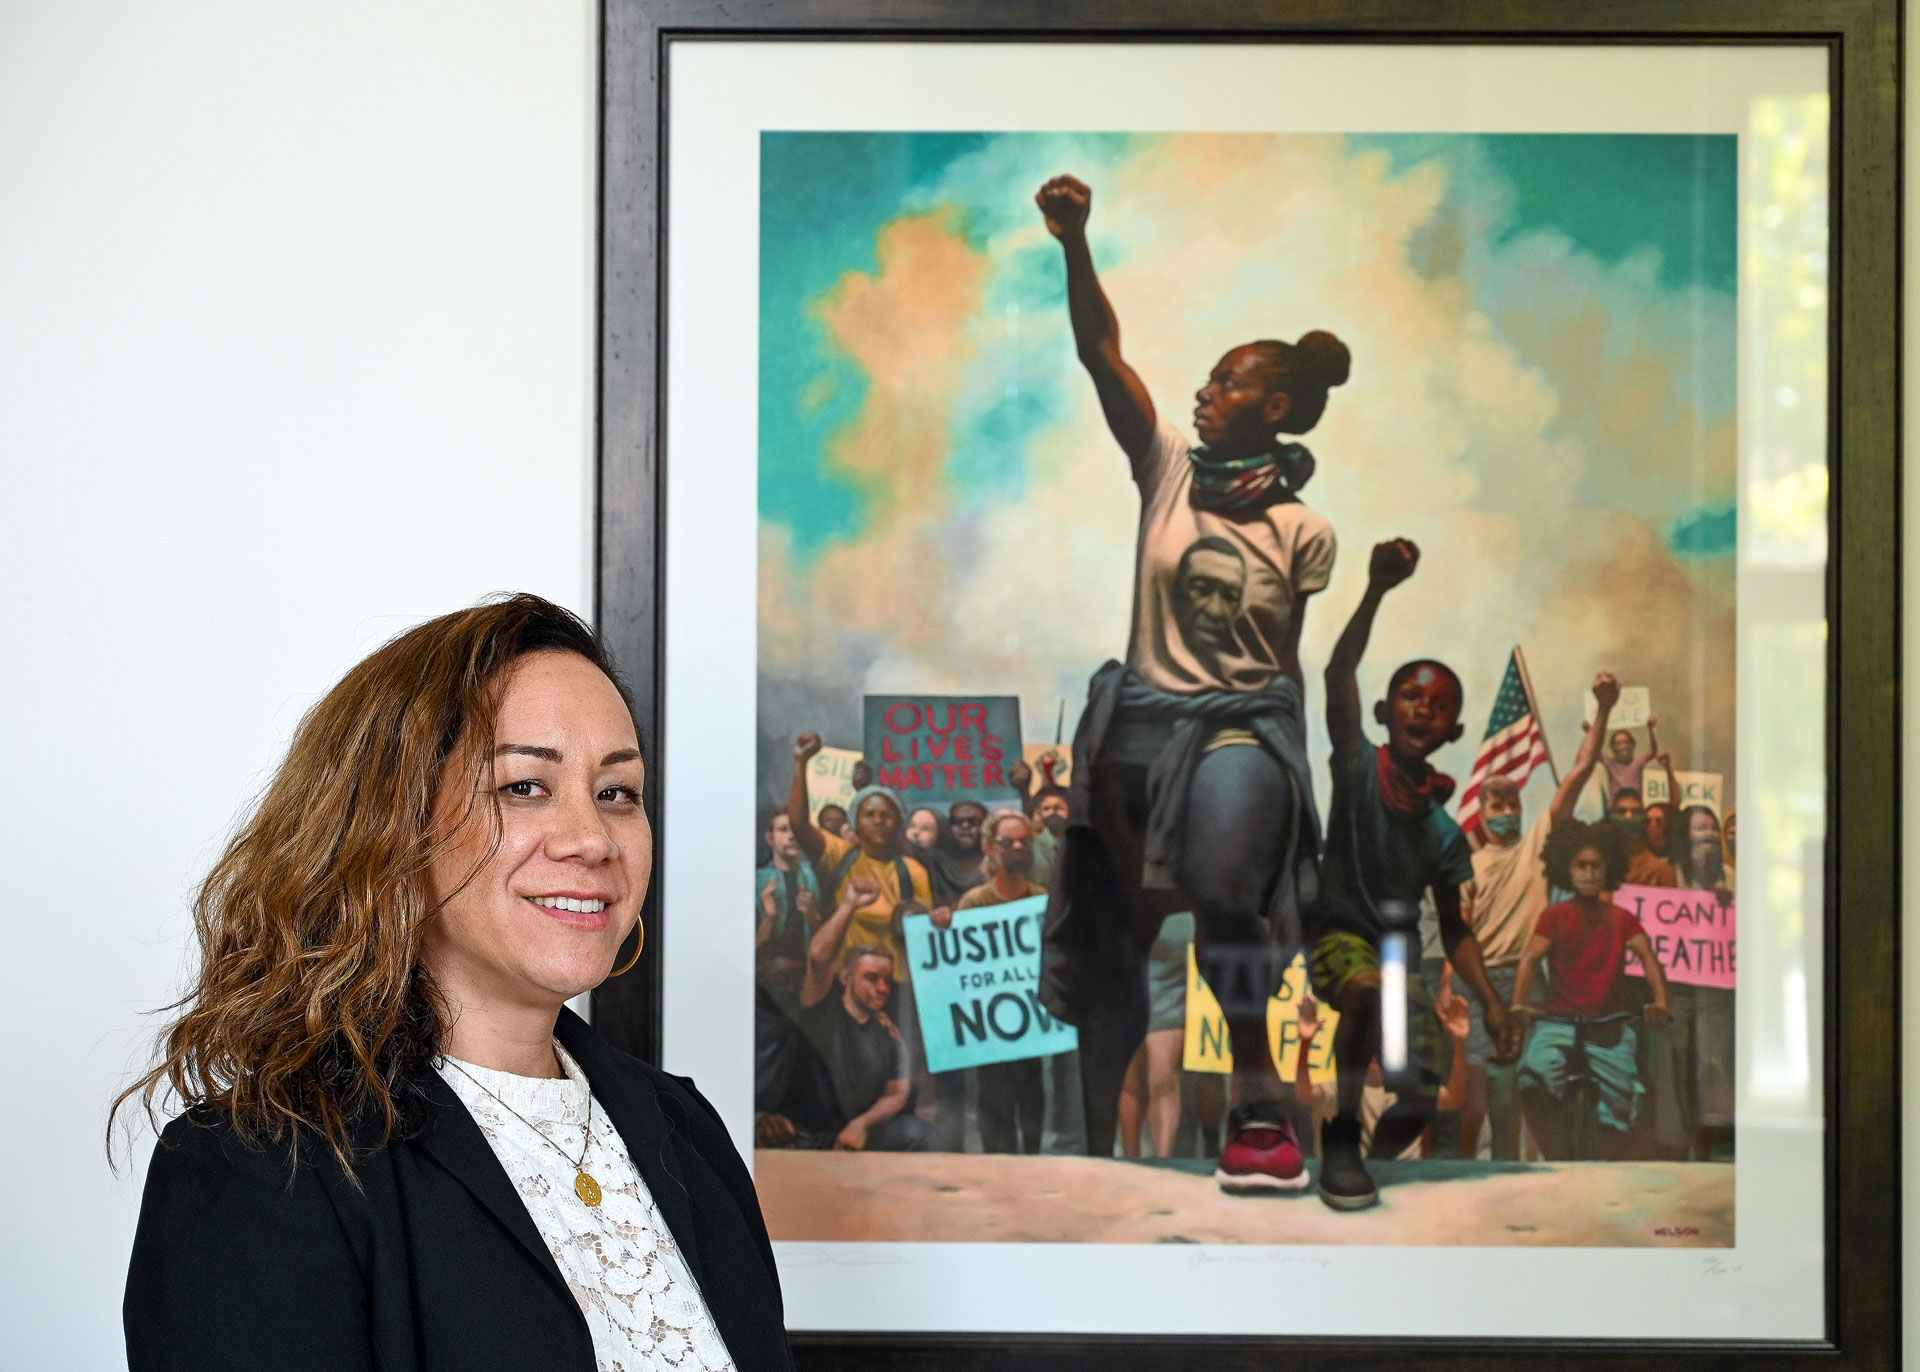 Dr. Kinikini stands next to Black power painting